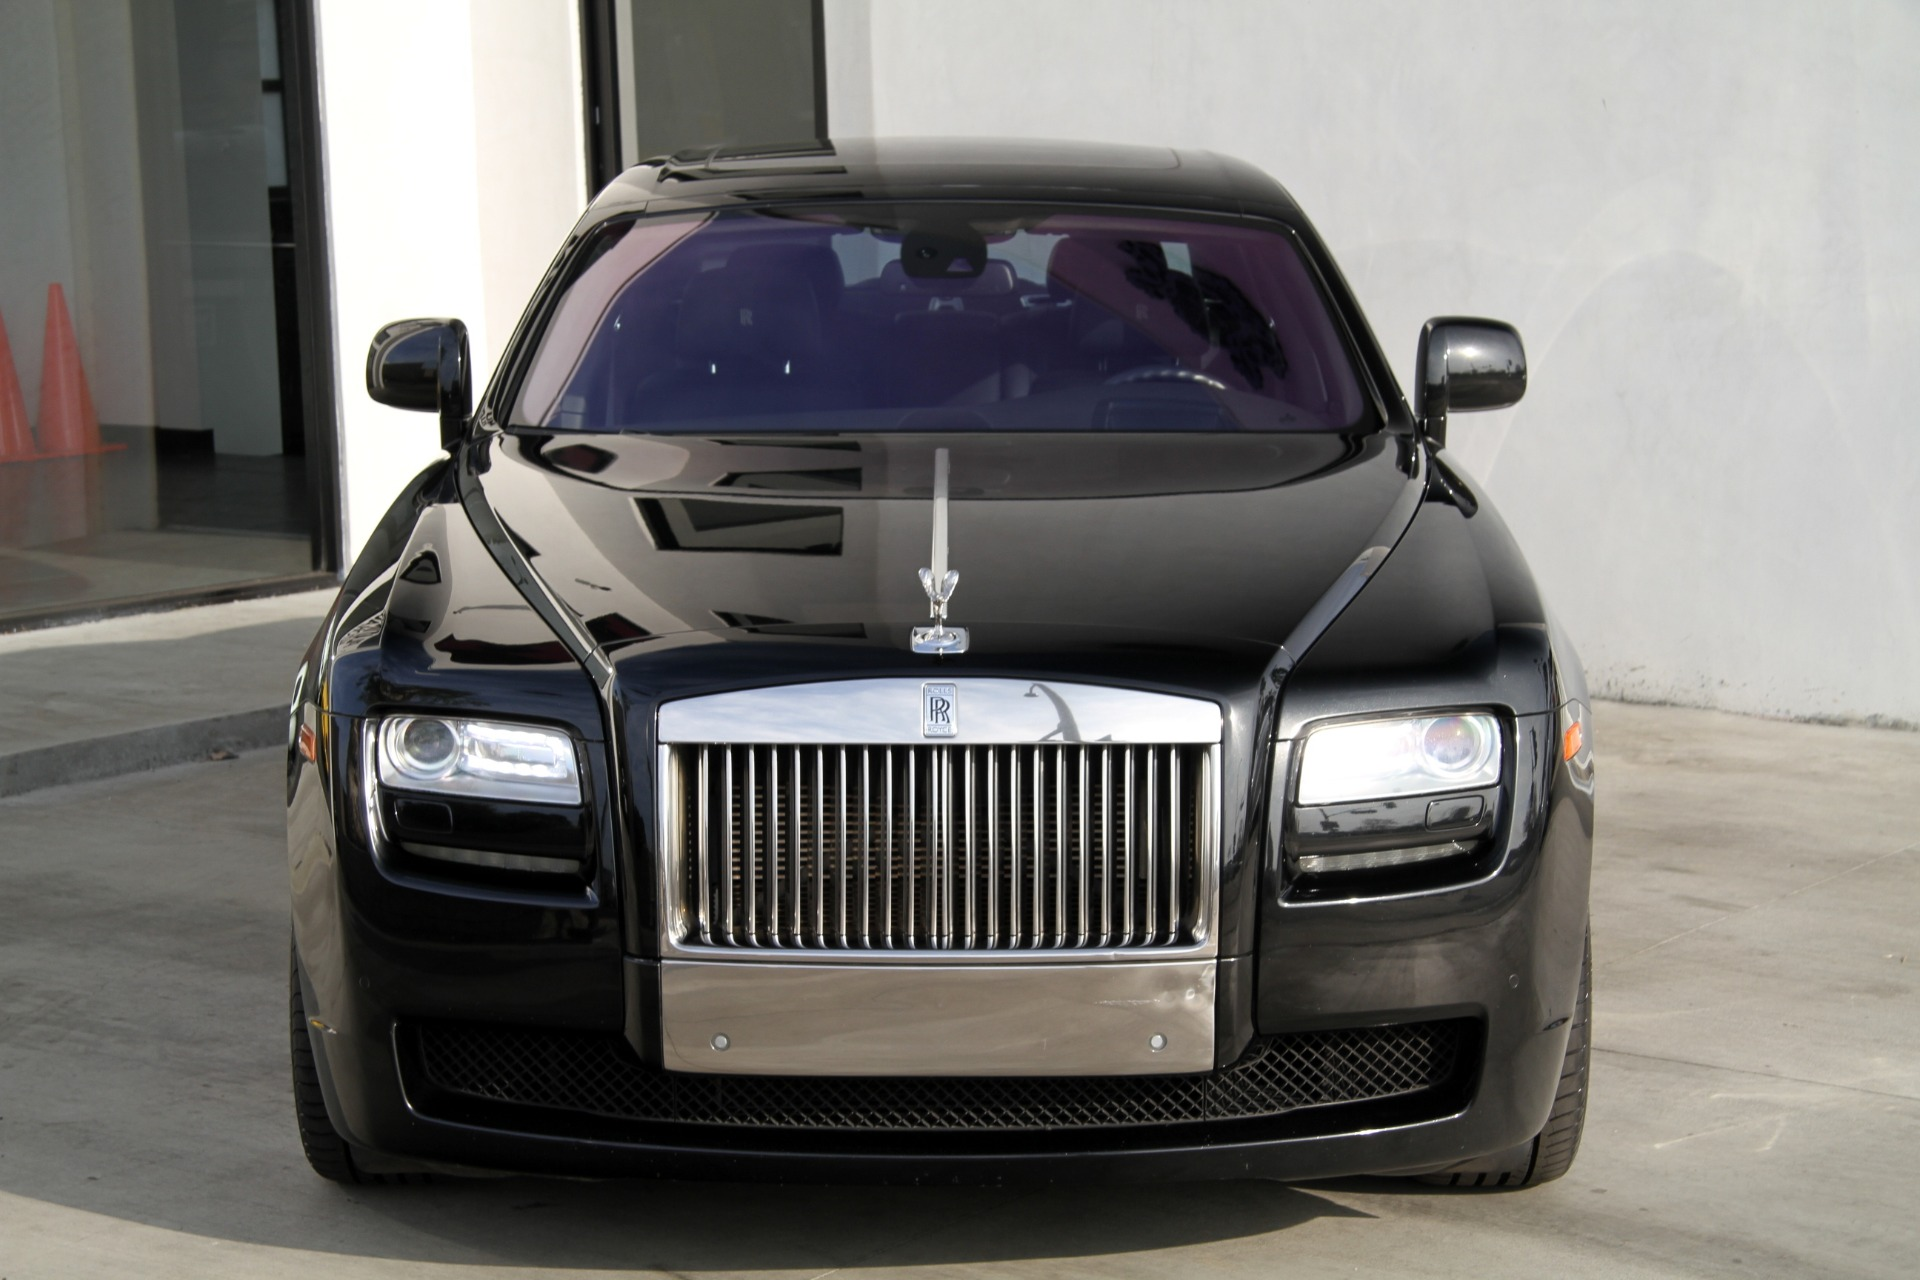 2011 Rolls Royce Ghost Stock 6087 For Sale Near Redondo